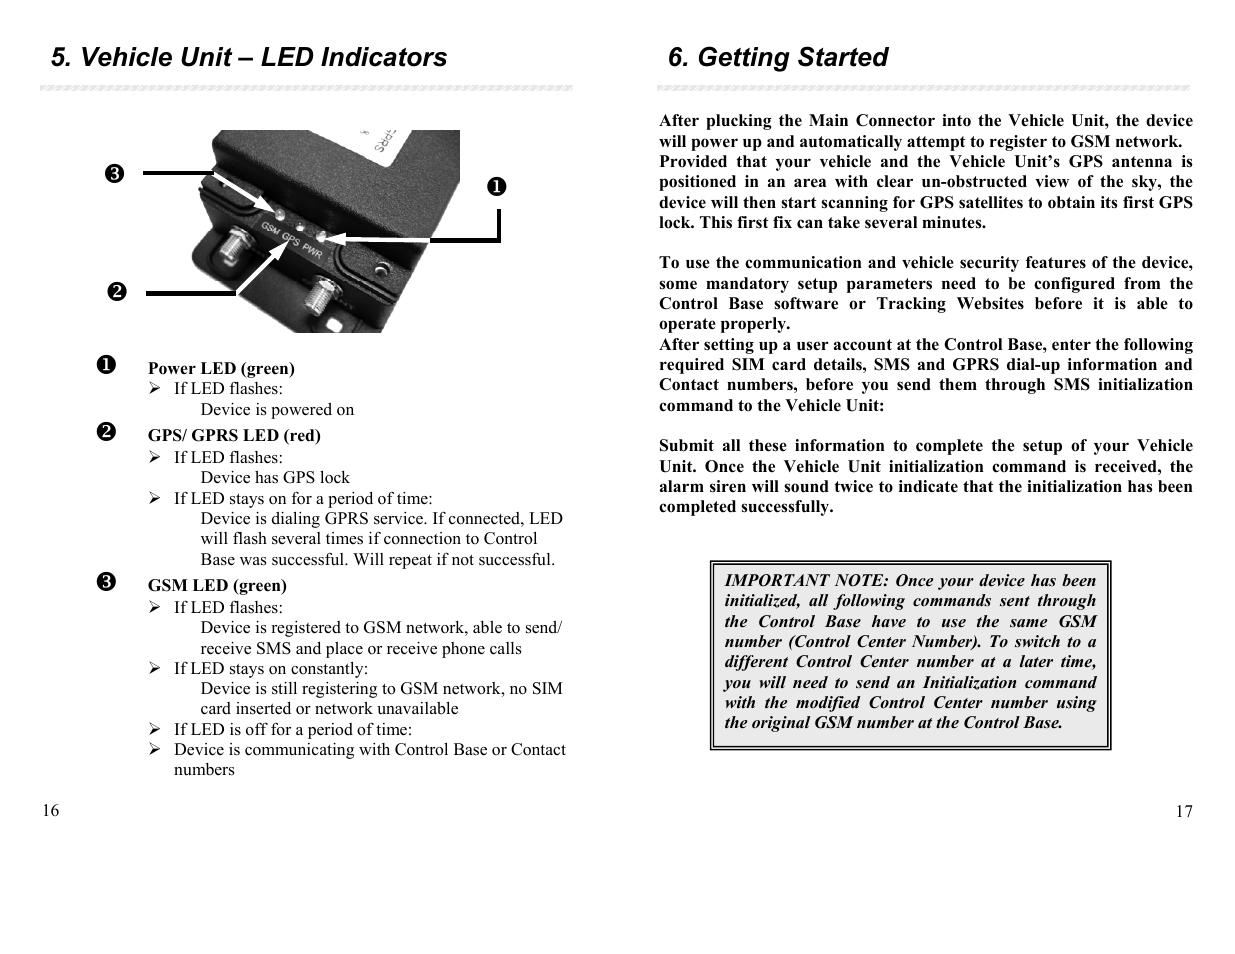 vehicle unit led indicators getting started apm sg vt02 qb user rh manualsdir com apm 2.6 user manual apm 2.6 user manual